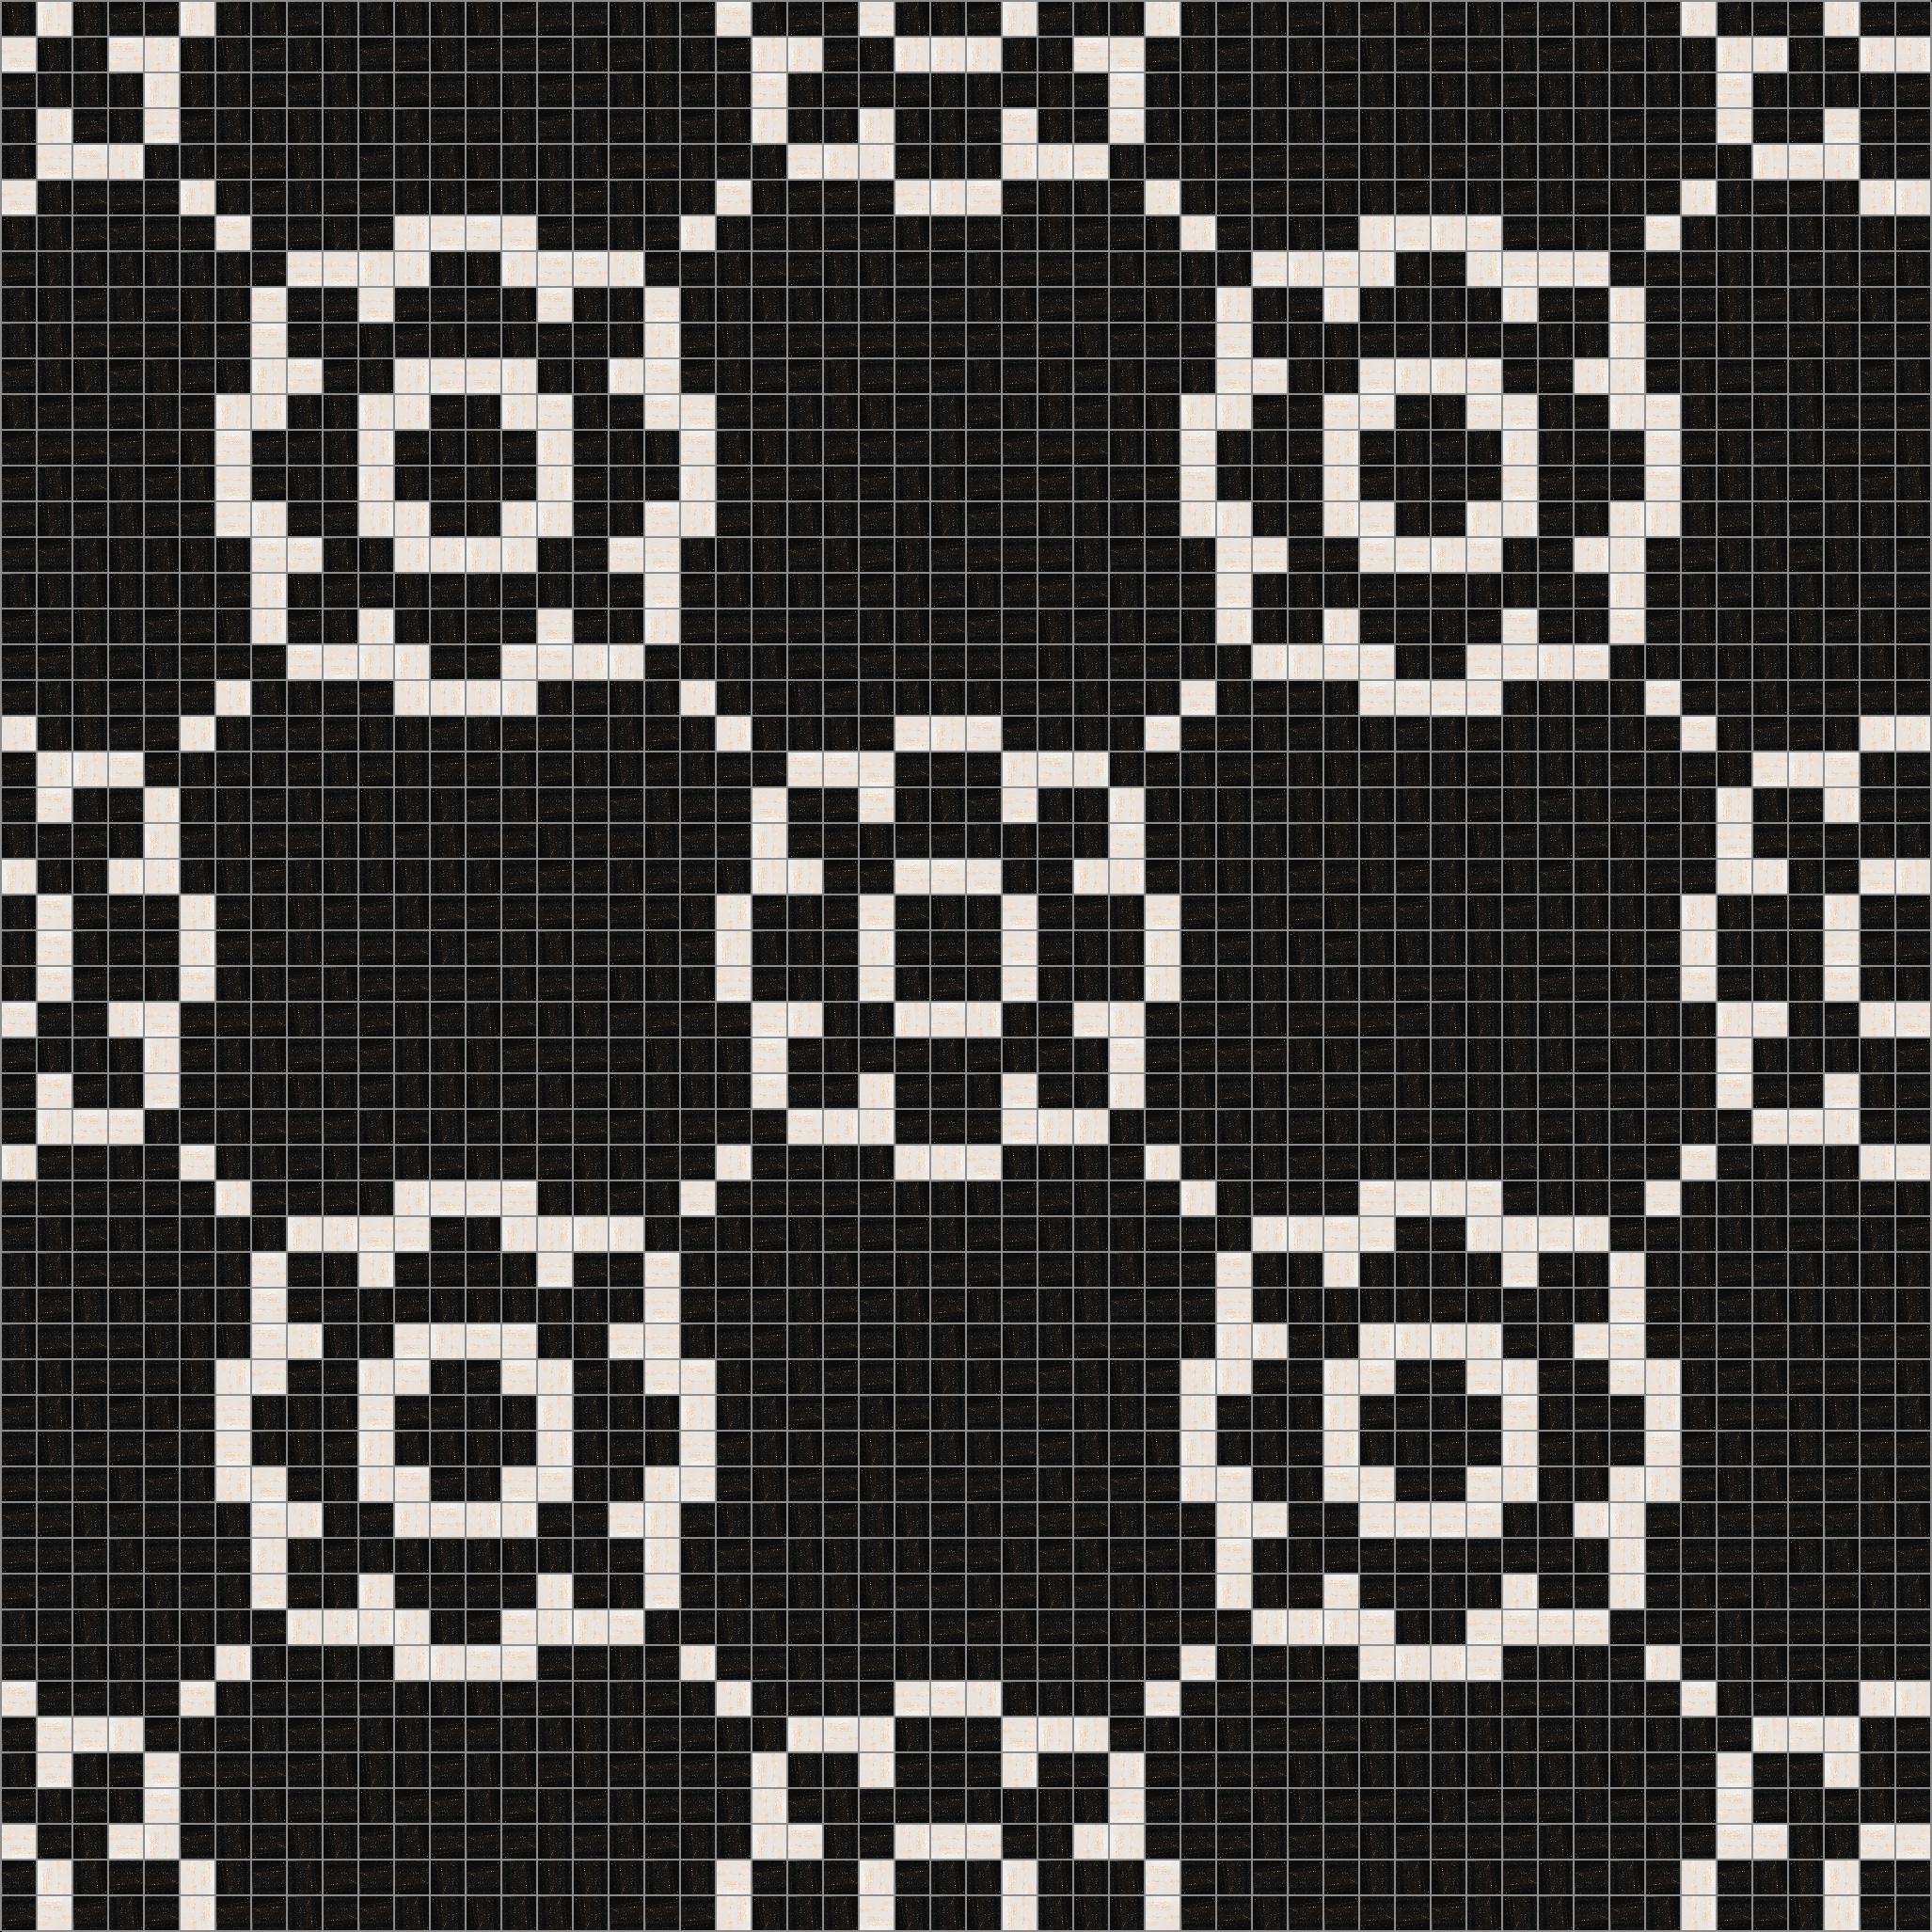 Traditional Flourish Mosaic Tile Pattern Modern Design